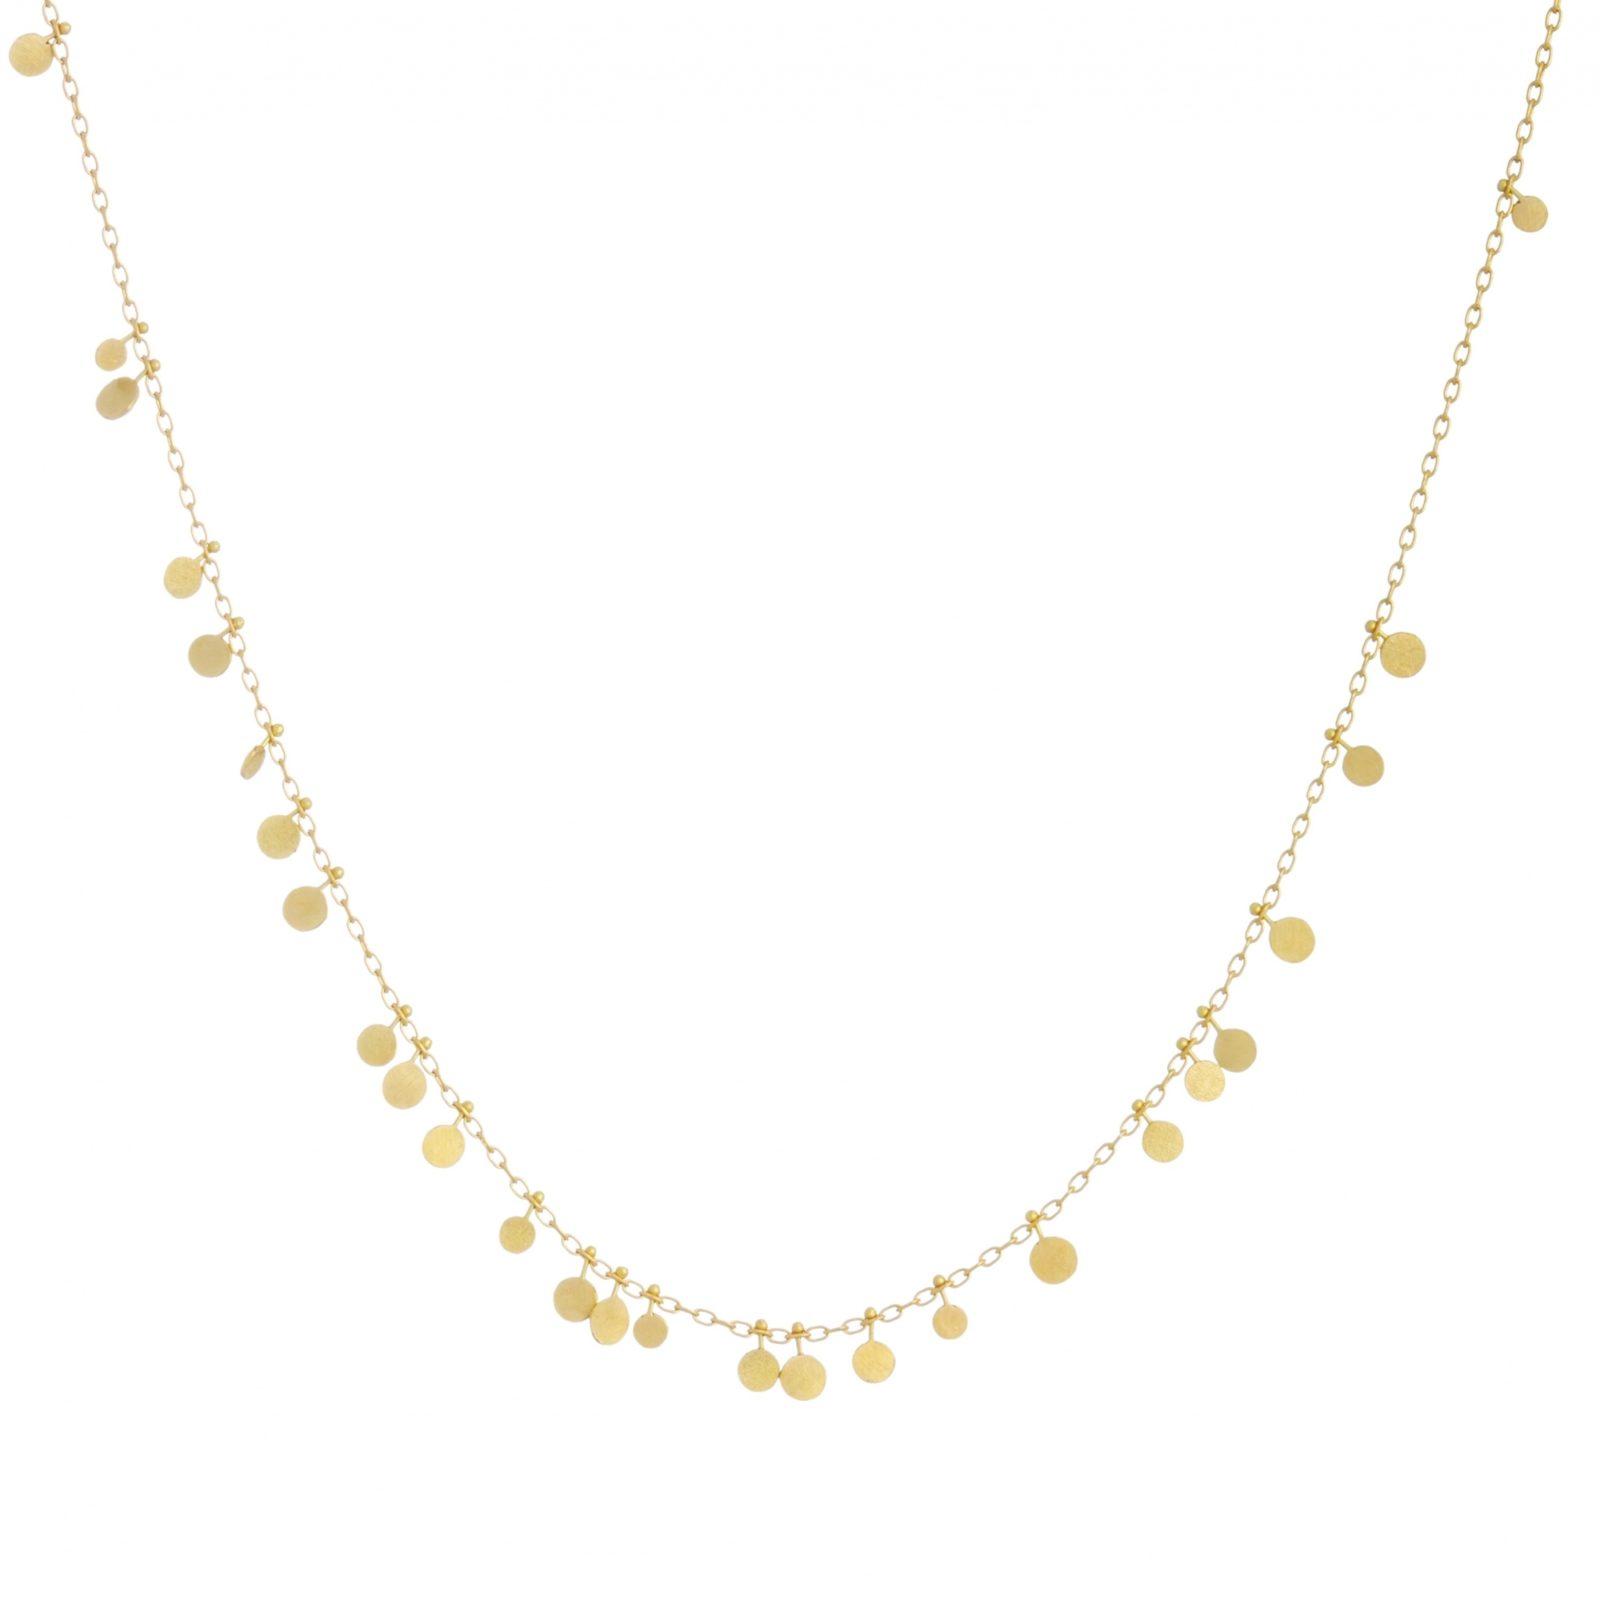 Sia Taylor DN31 Y Random Yellow Gold Dots Necklace WB